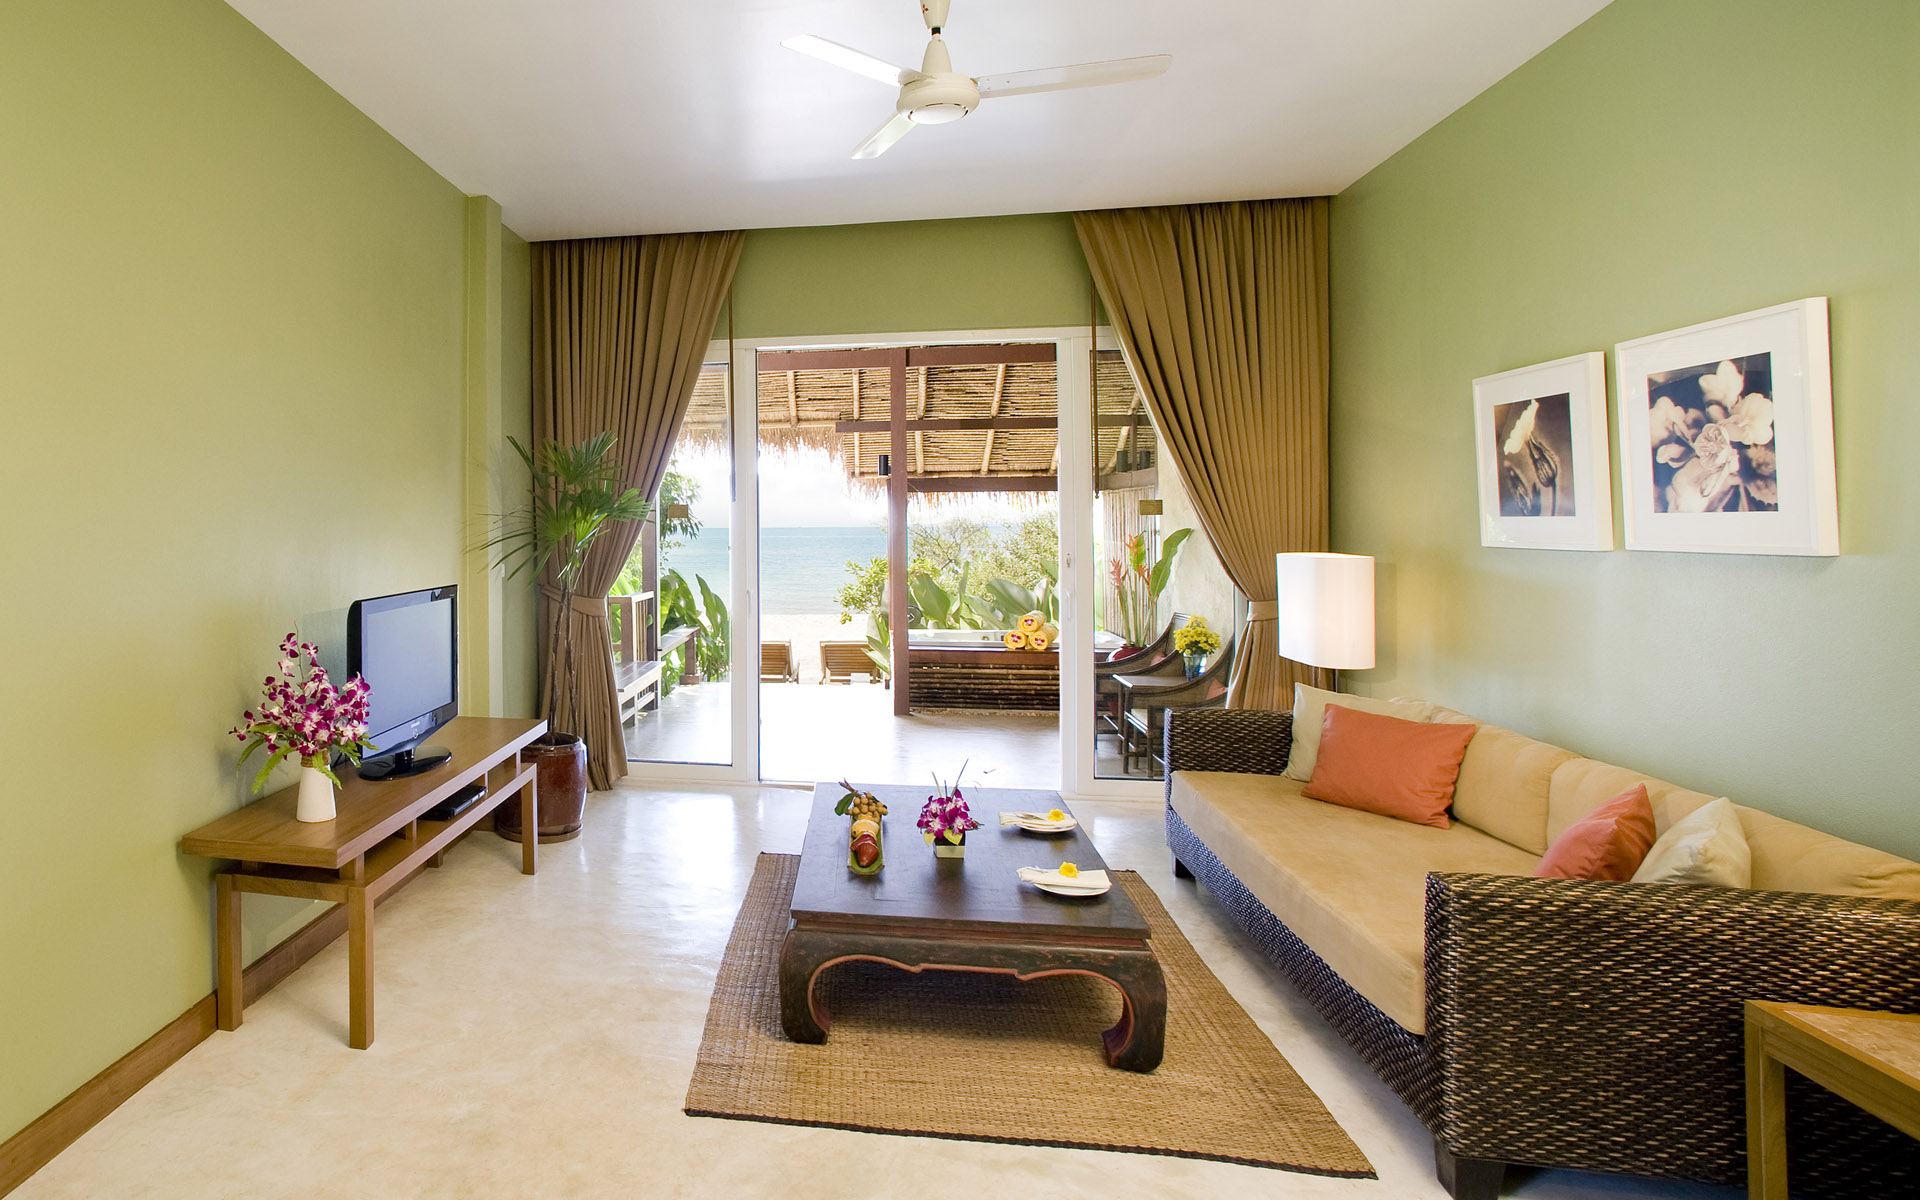 living room decorating ideas in nigeria mission style furniture light green interior idea | design